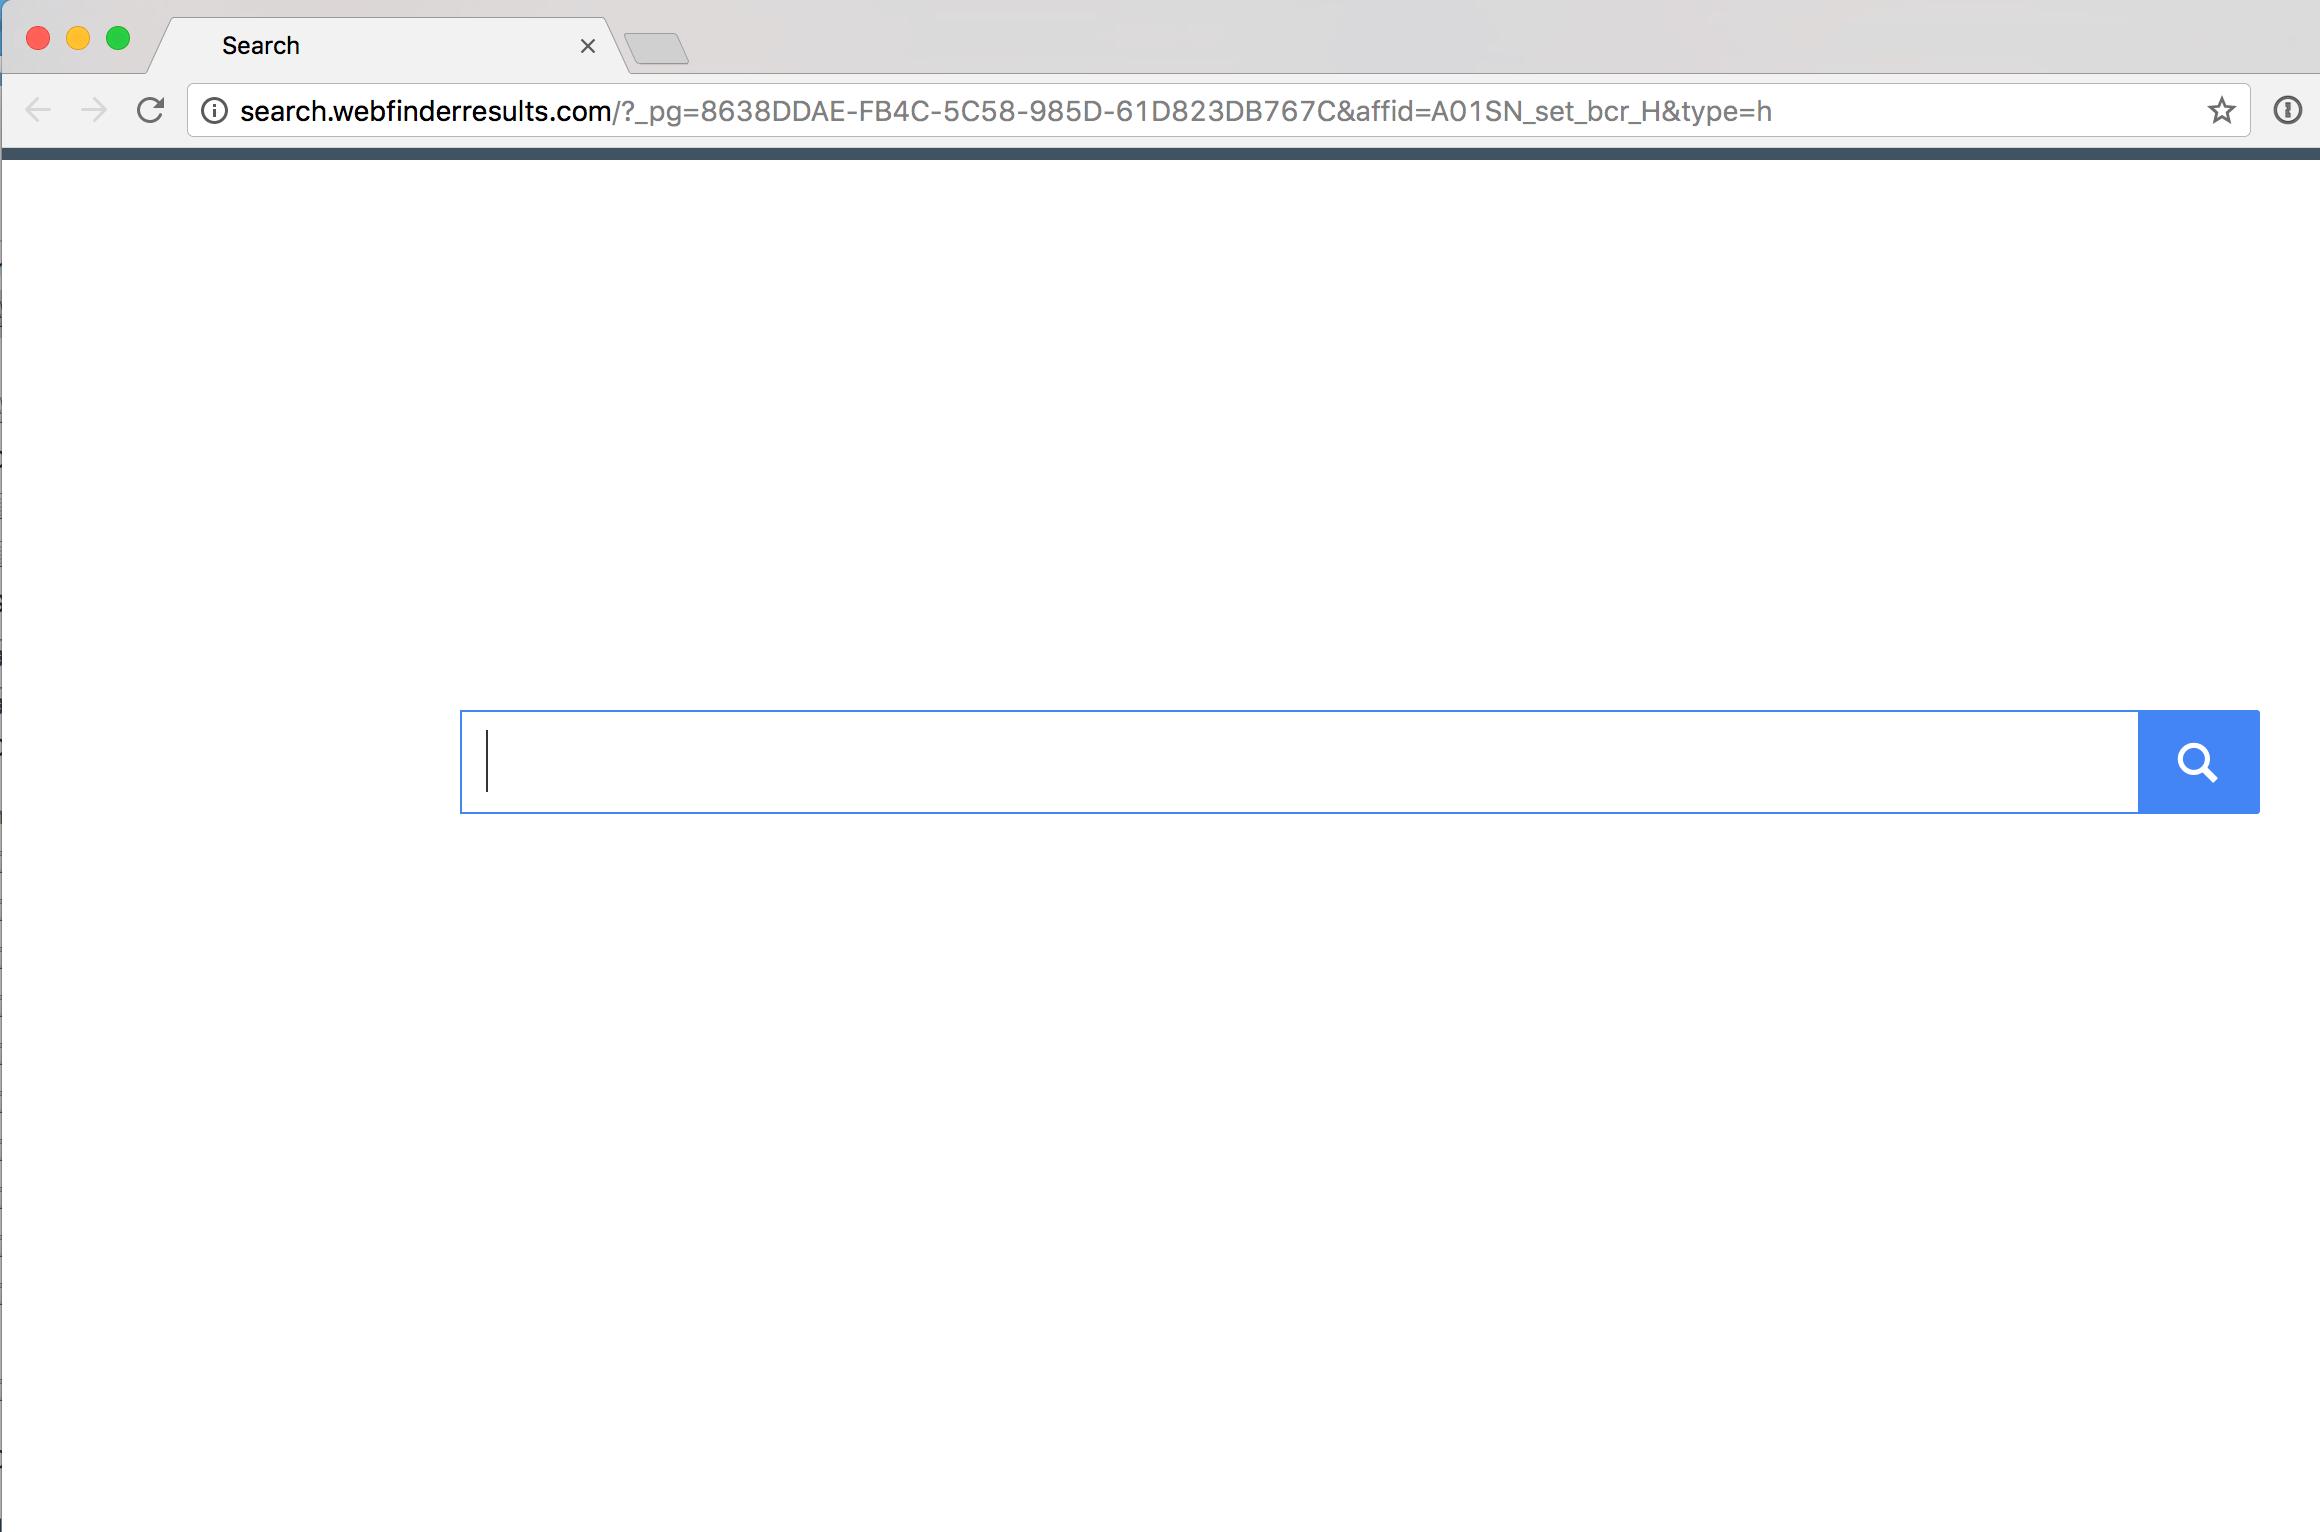 search.webfinderresults.com